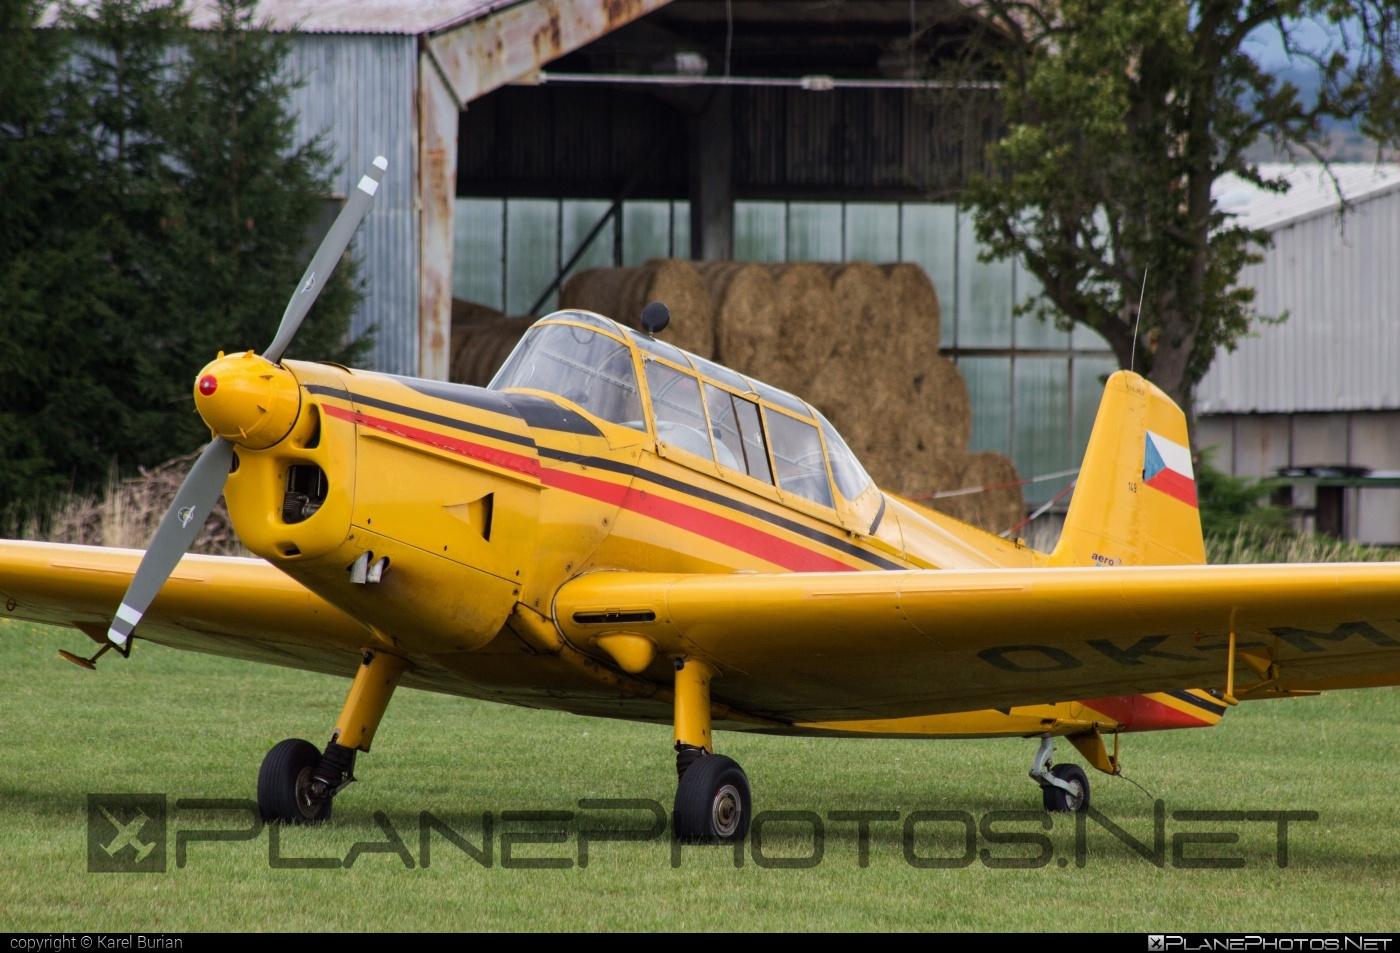 Zlin Z-226MS Trenér - OK-MFE operated by Aeroklub Rakovník #z226 #z226trener #zlin #zlin226 #zlintrener